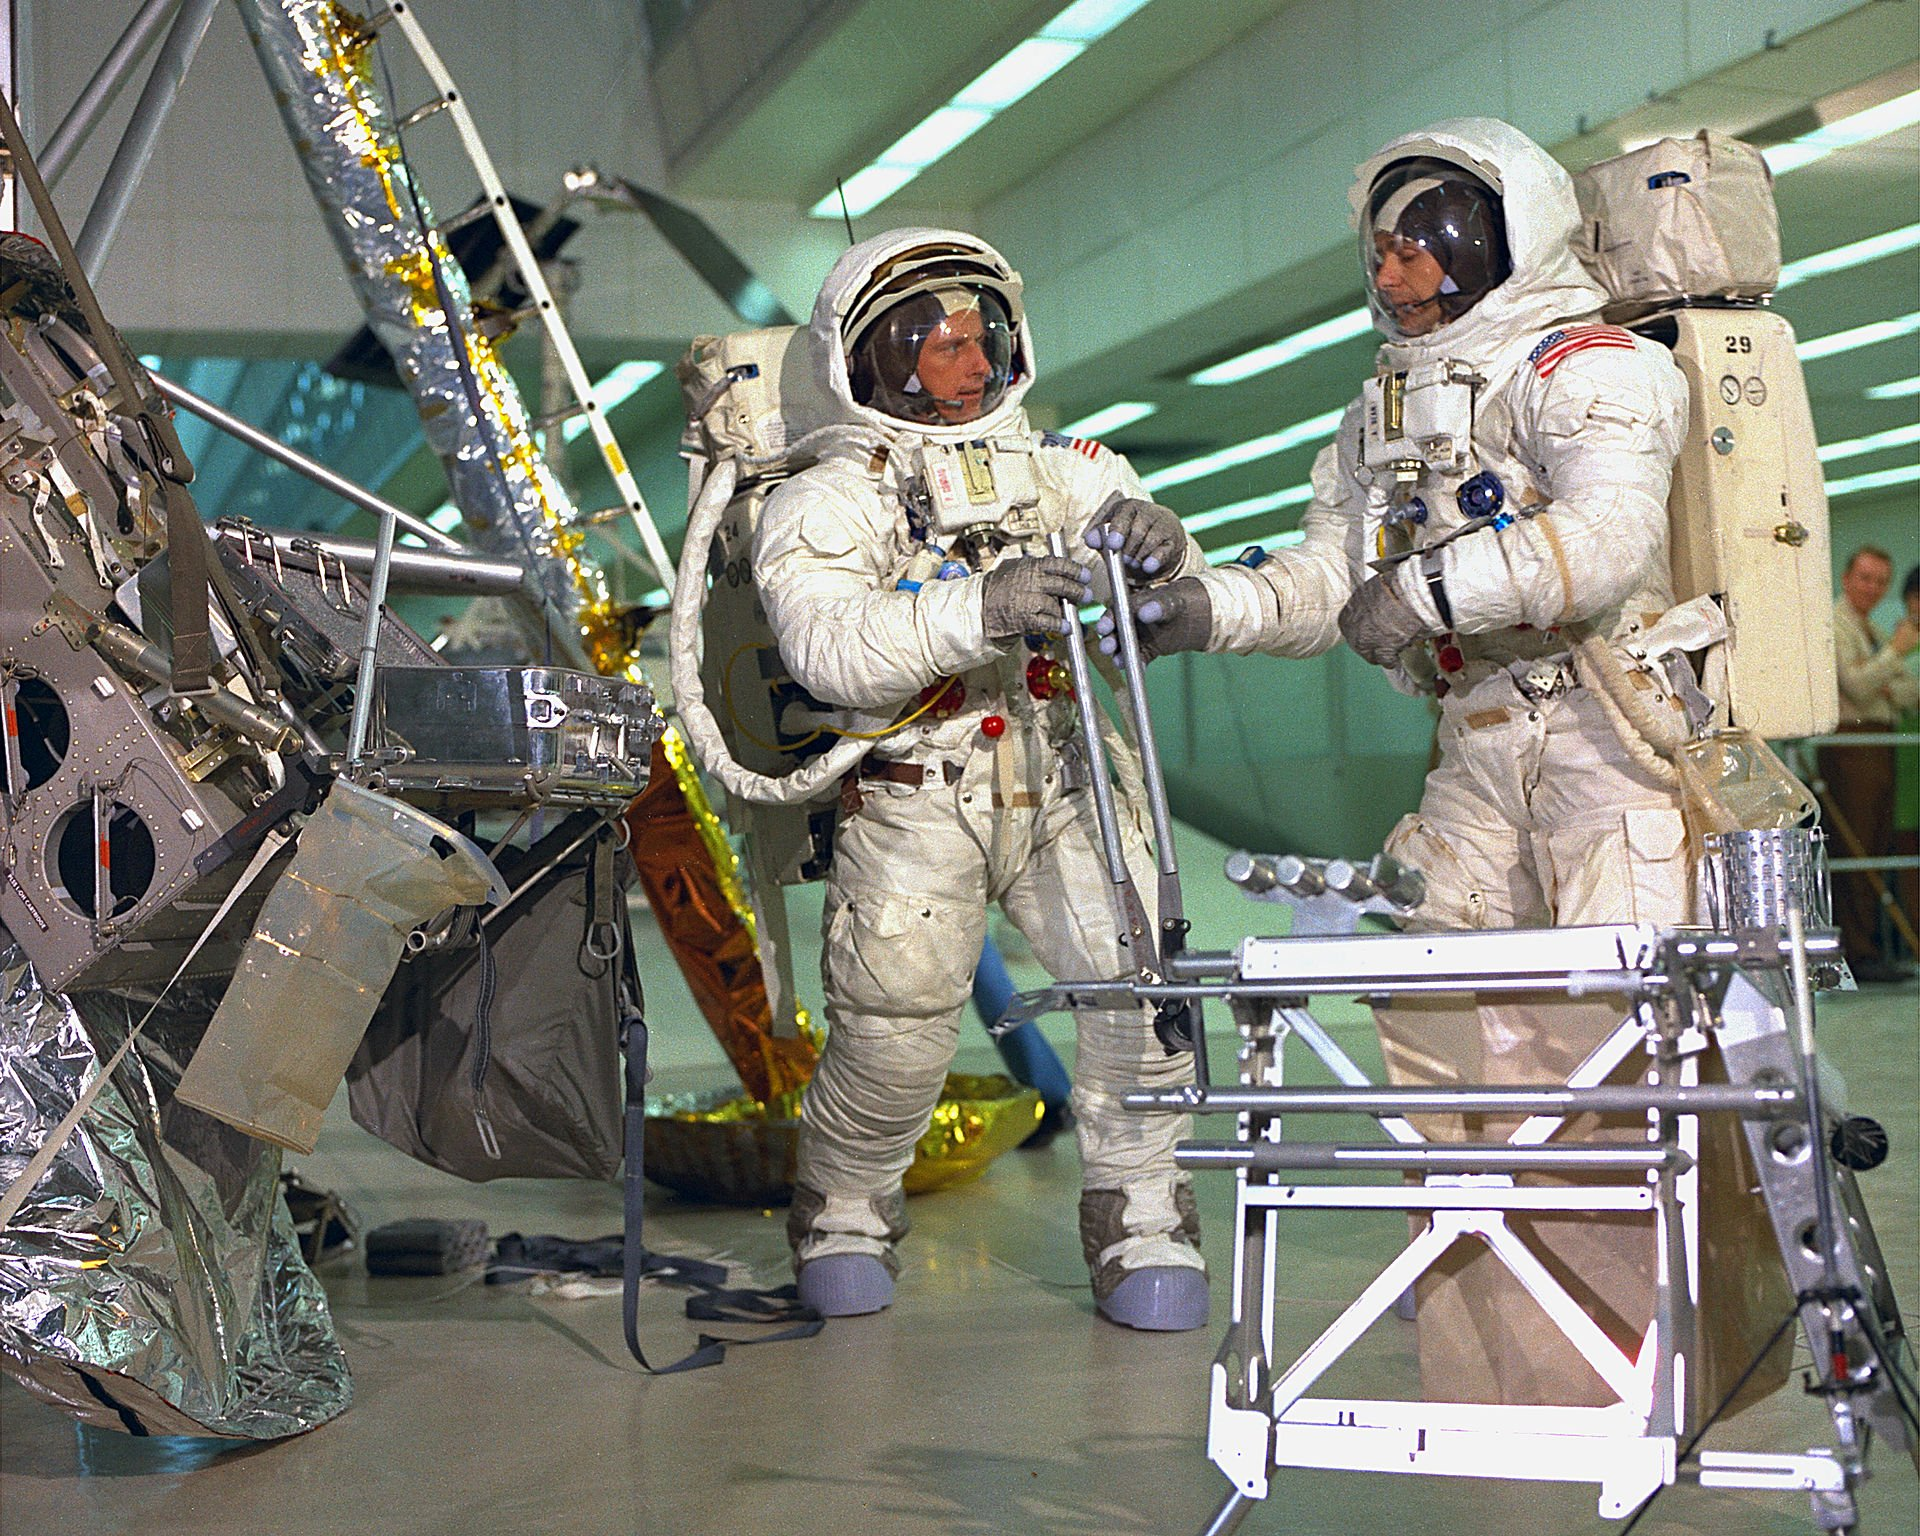 Apollo 12 astronauts Pete Conrad and Alan Bean simulate an EVA (Extravehicular Activity) at the Flight Crew Training Building. Courtesy of NASA.